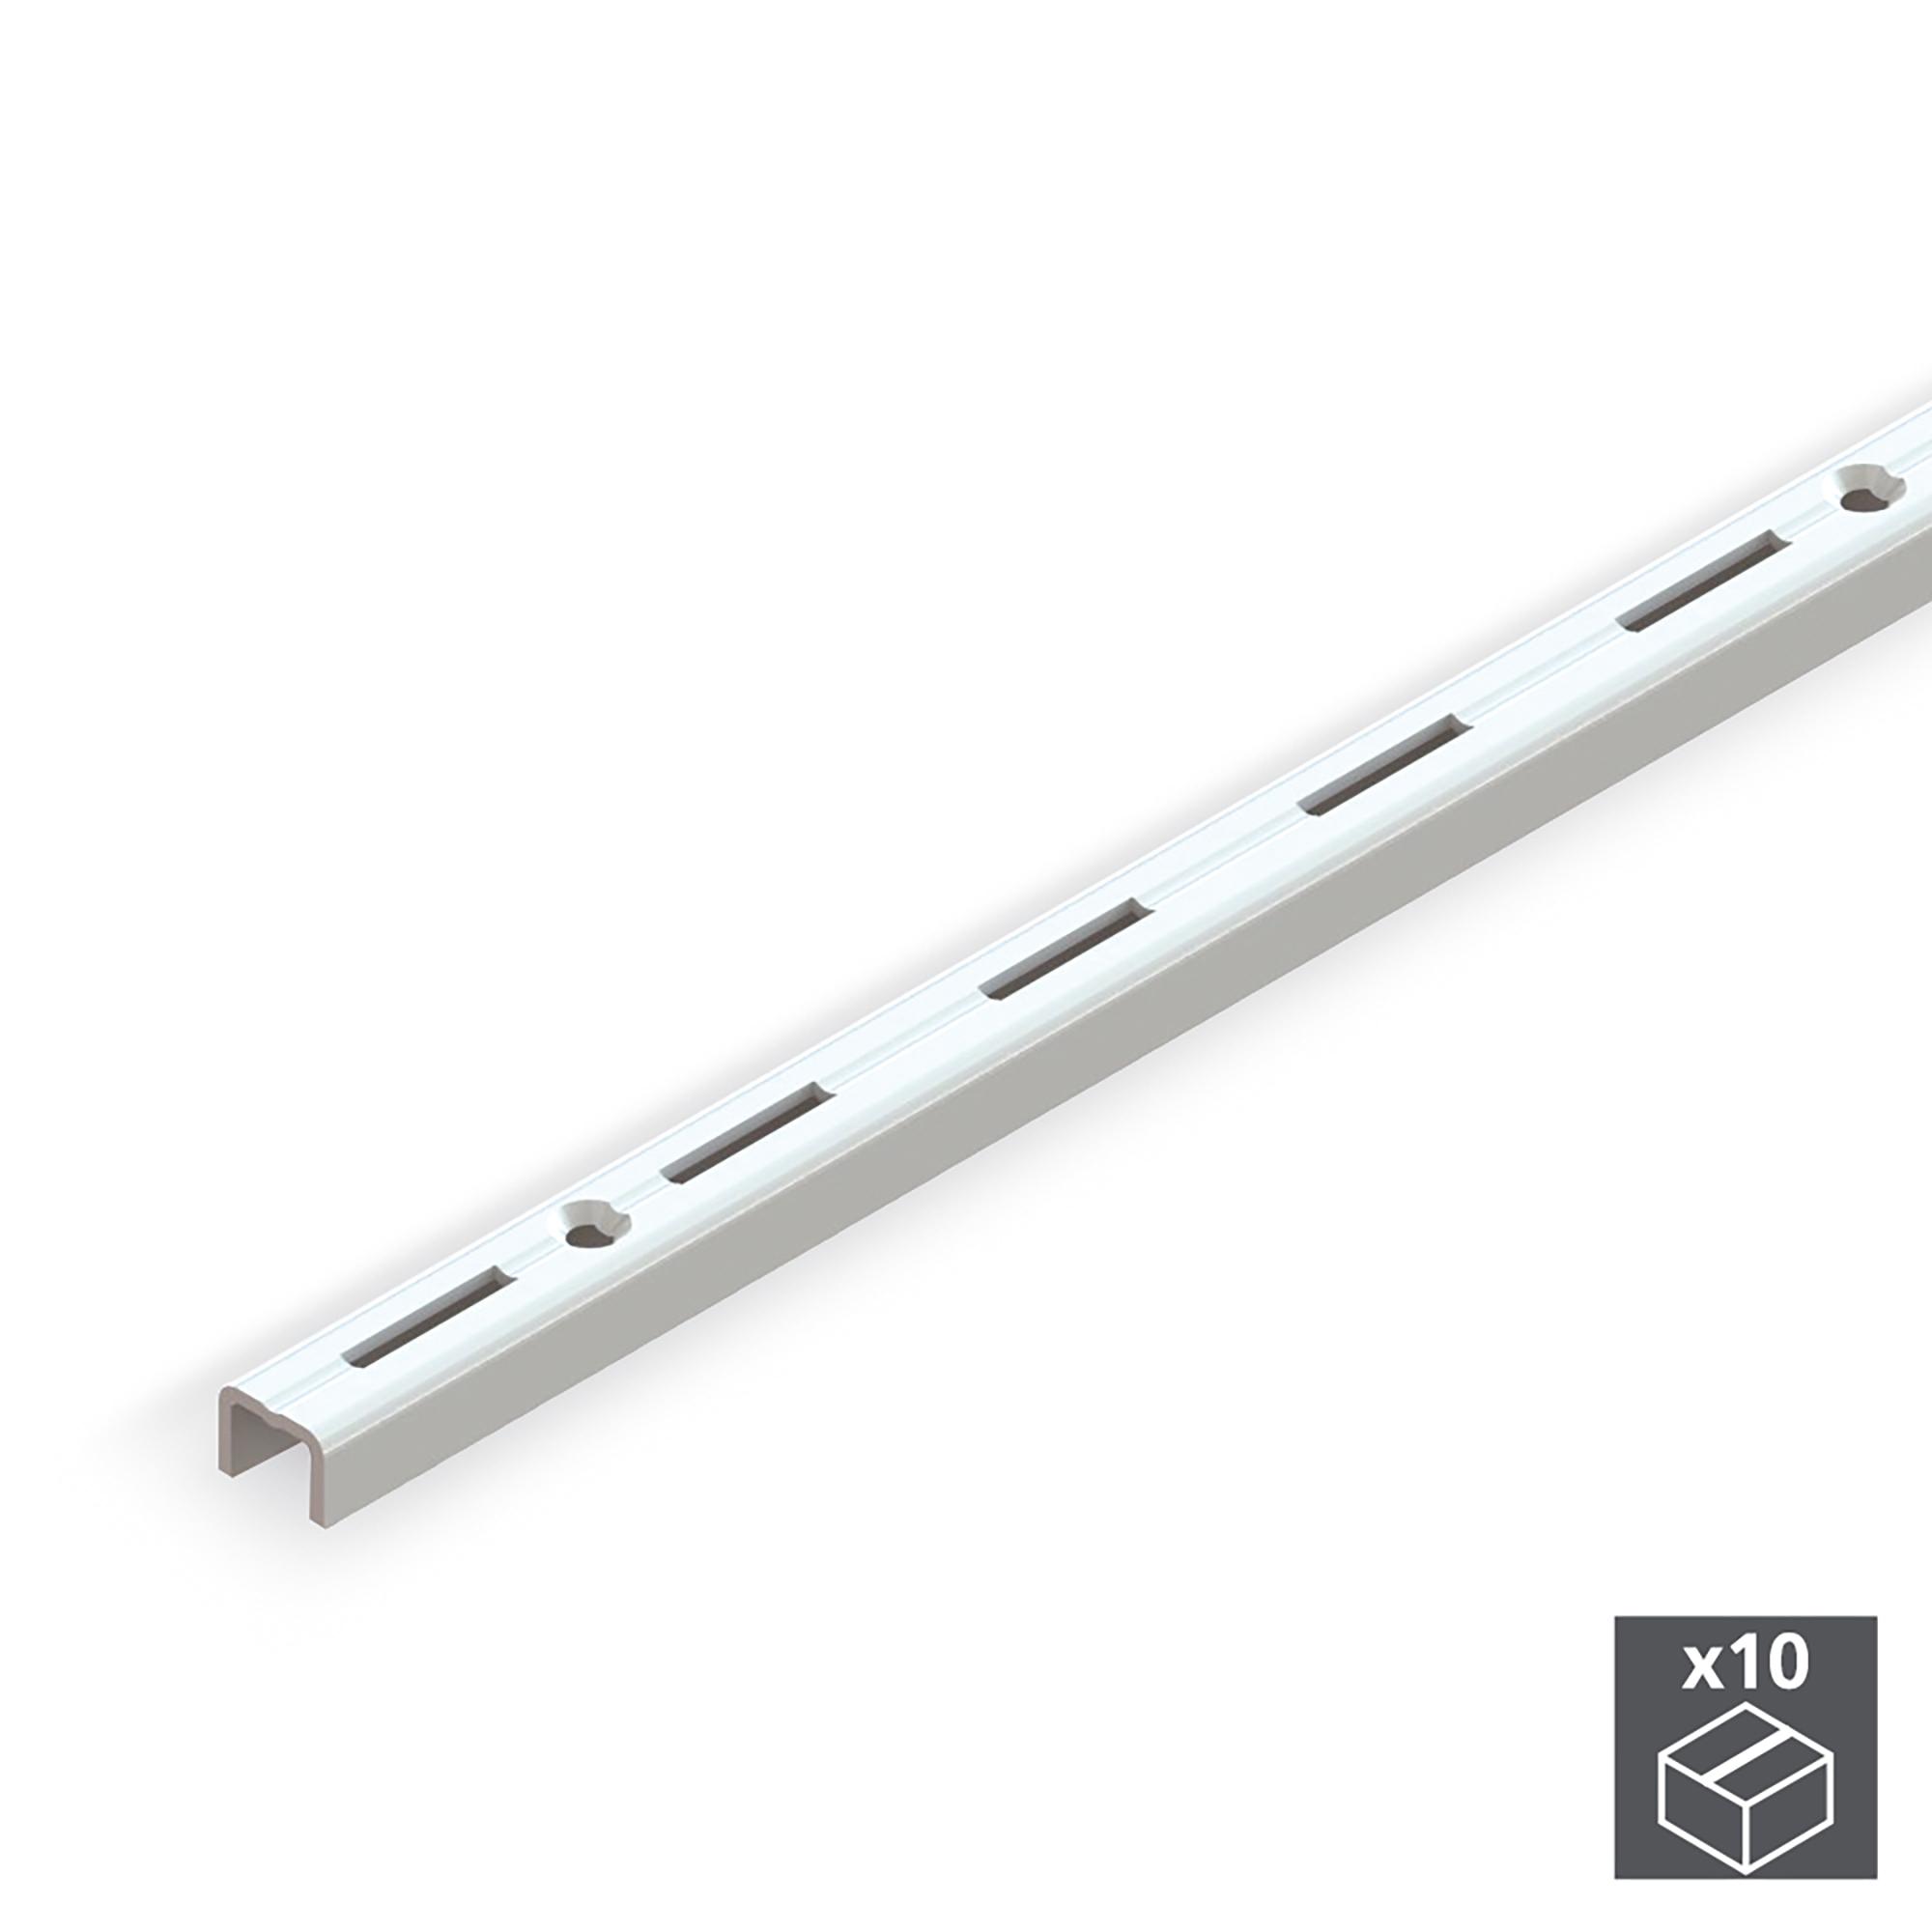 Emuca Profili da armadio, cremagliera semplice, passo 50 mm, 1000 mm, Acciaio, Bianco, 10 u.